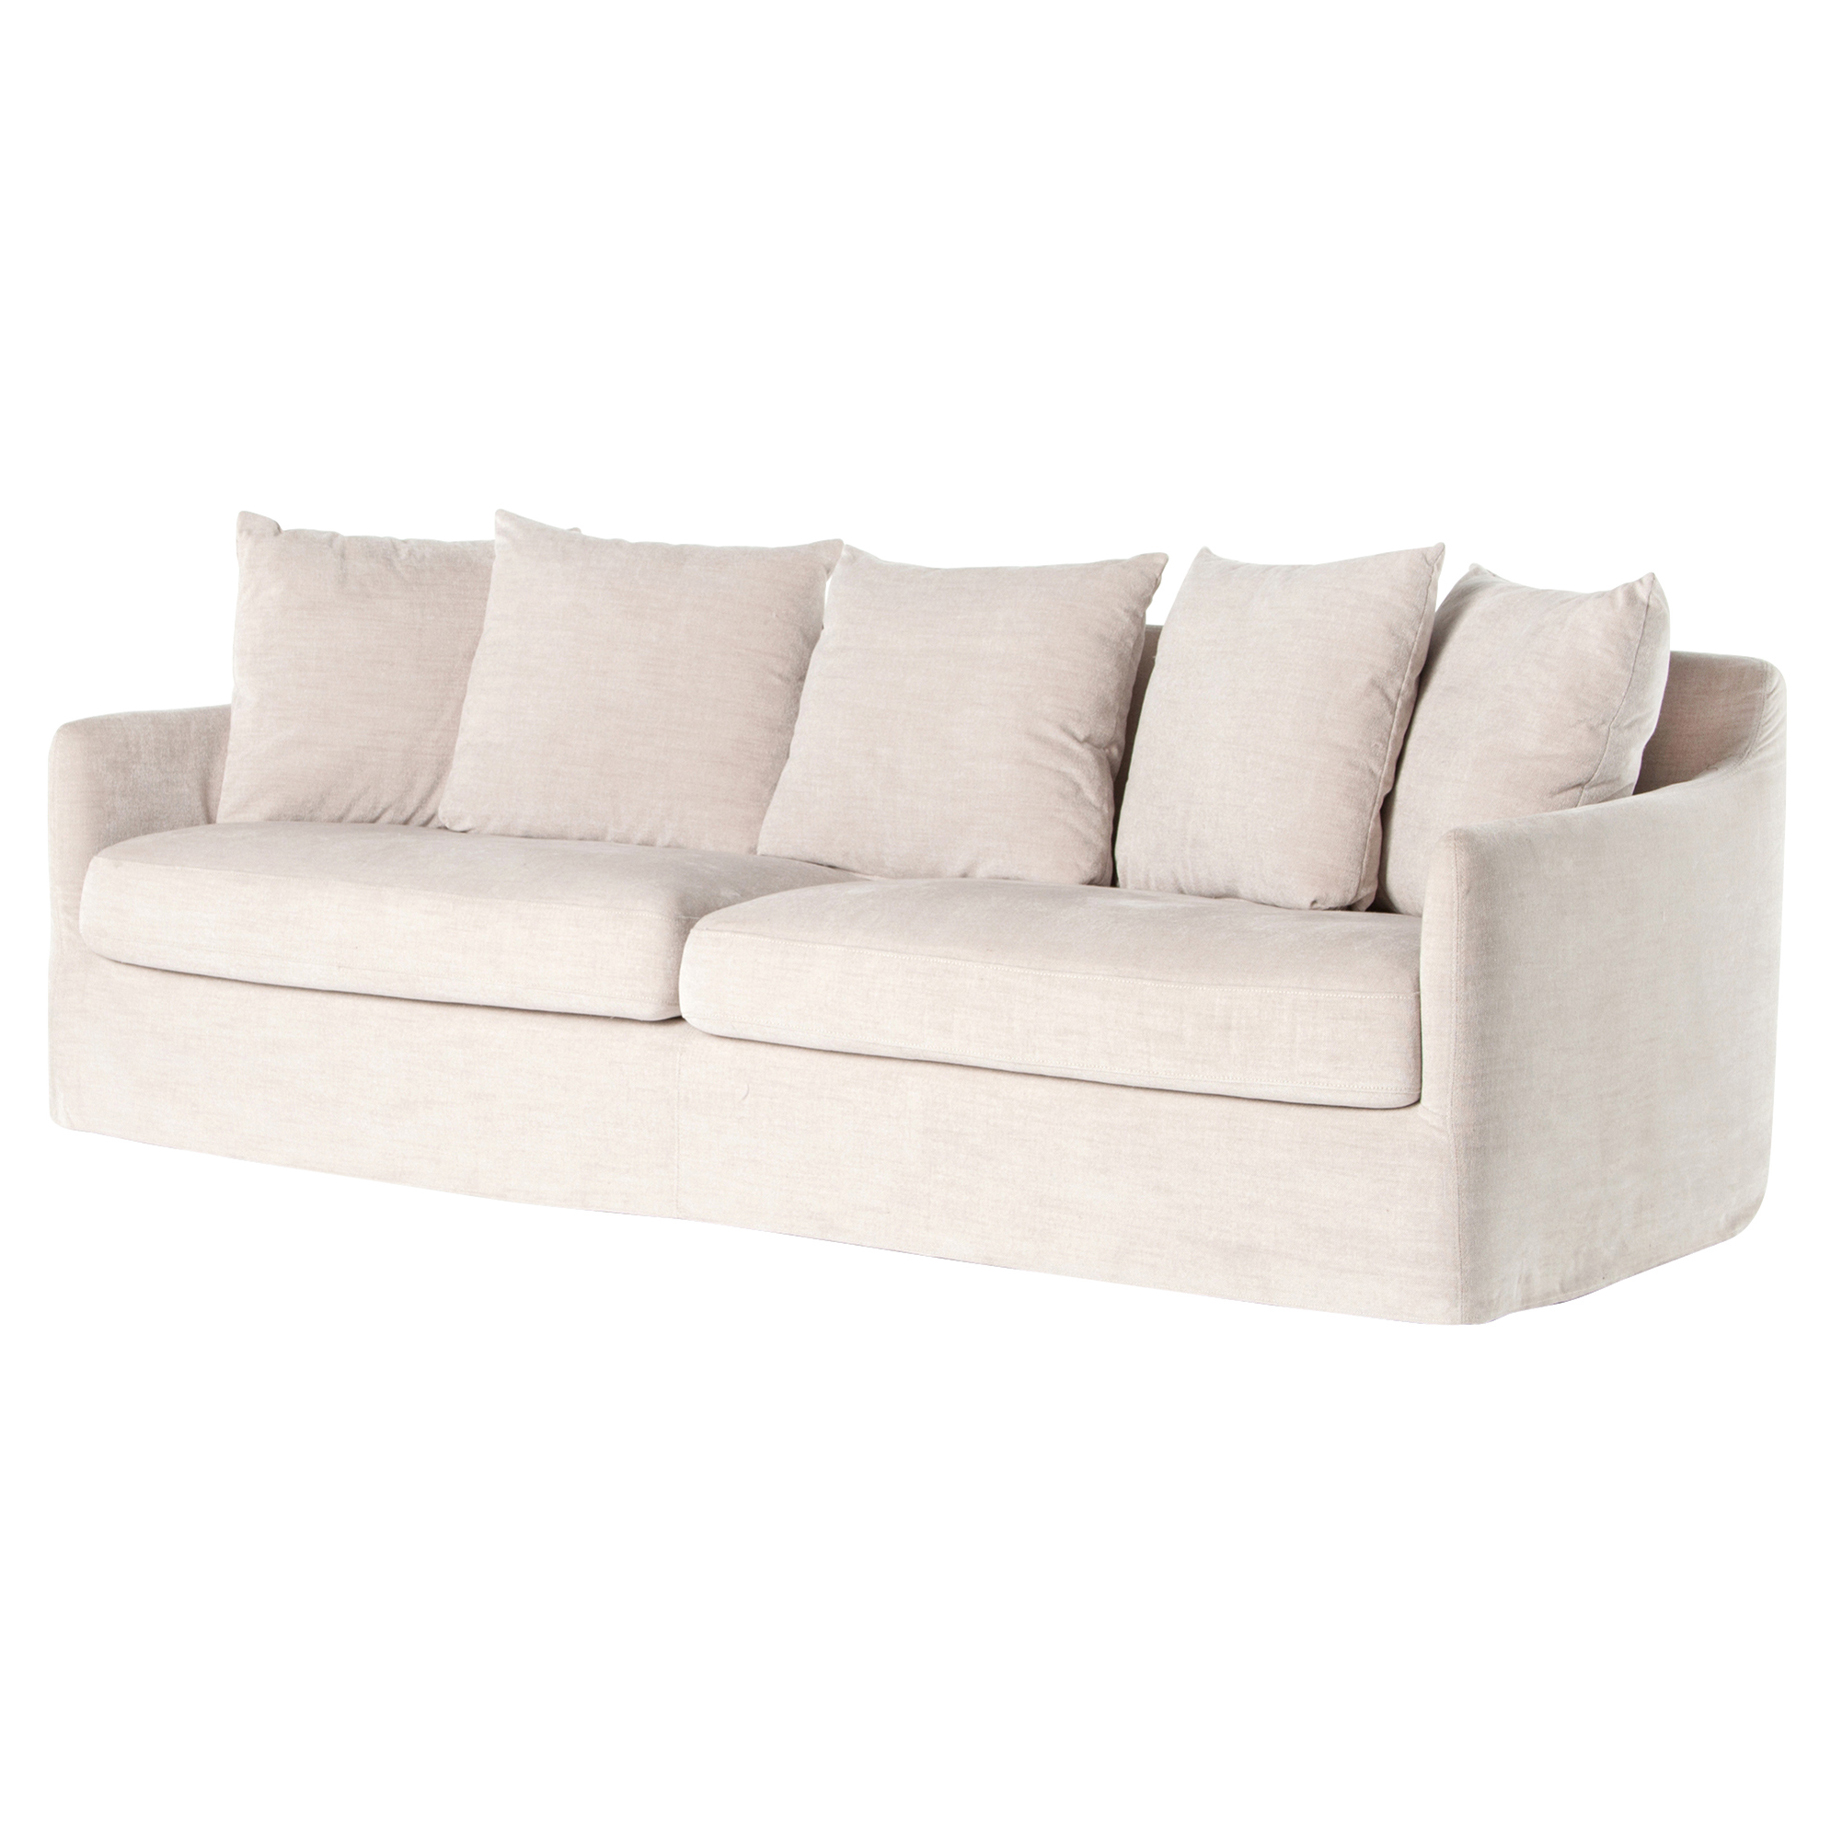 Delphina Coastal Ivory Slipcover Rounded Sofa